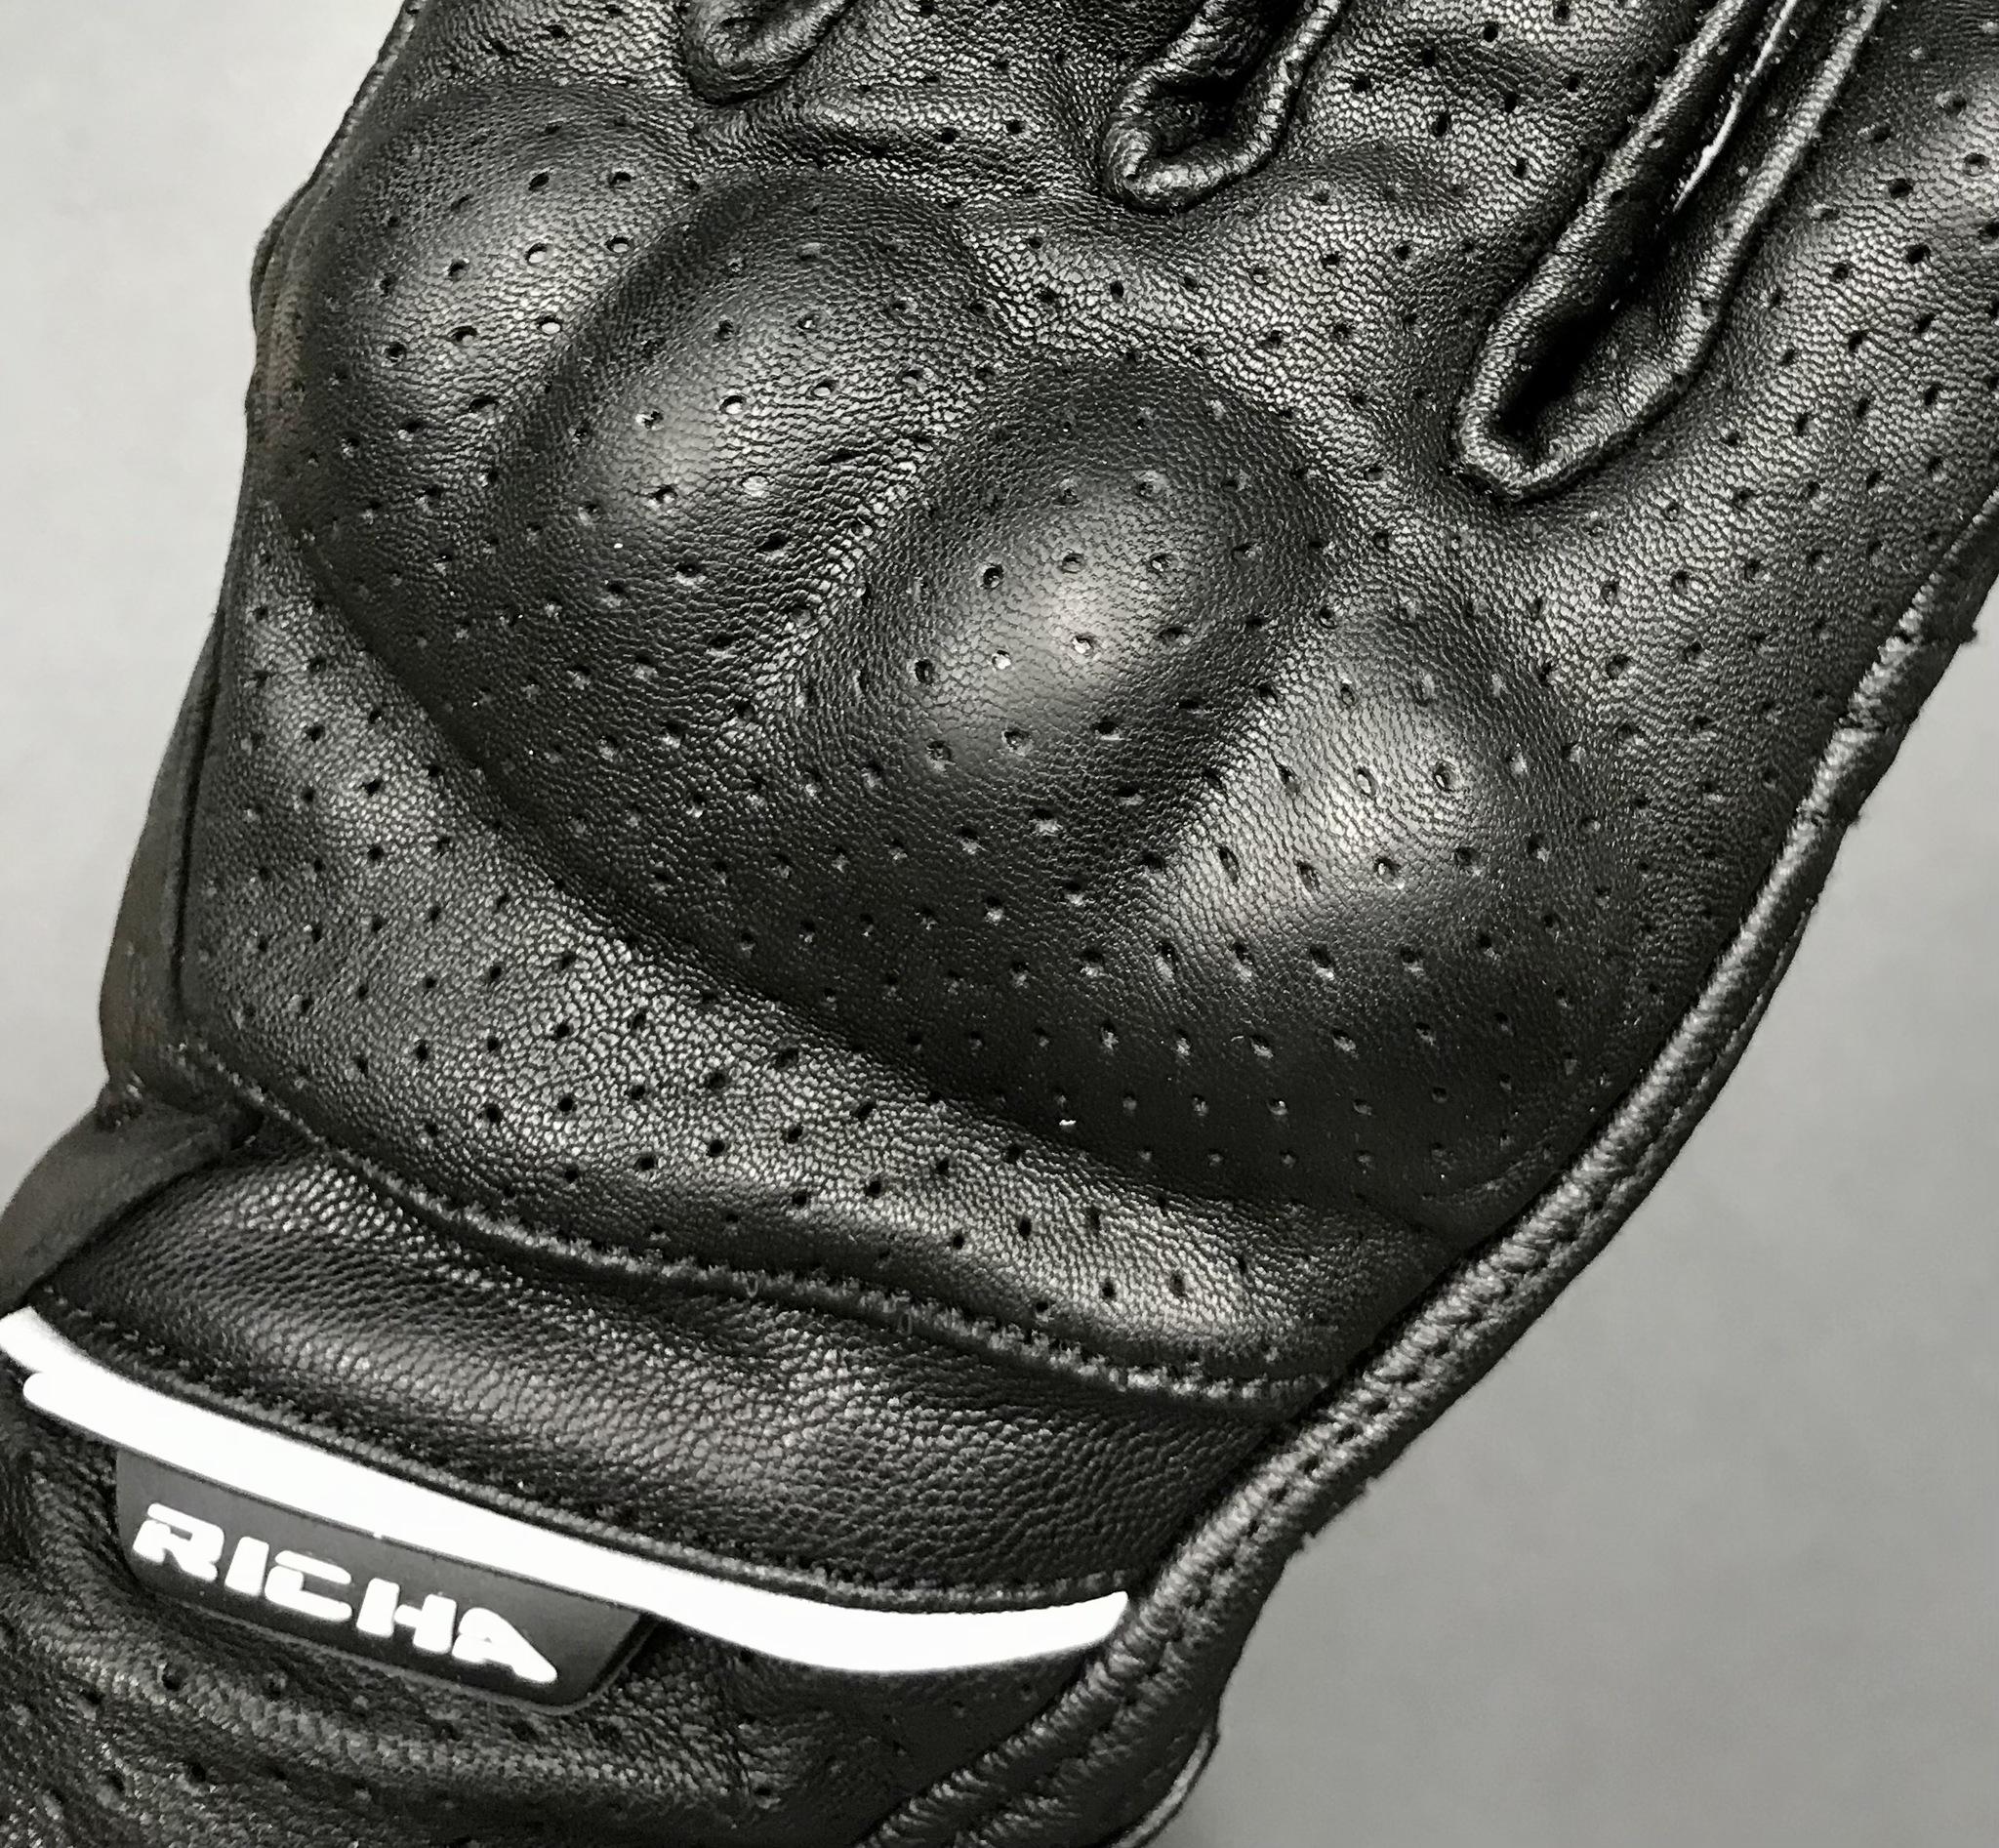 RICHA CRUISER GLOVES Perforated black